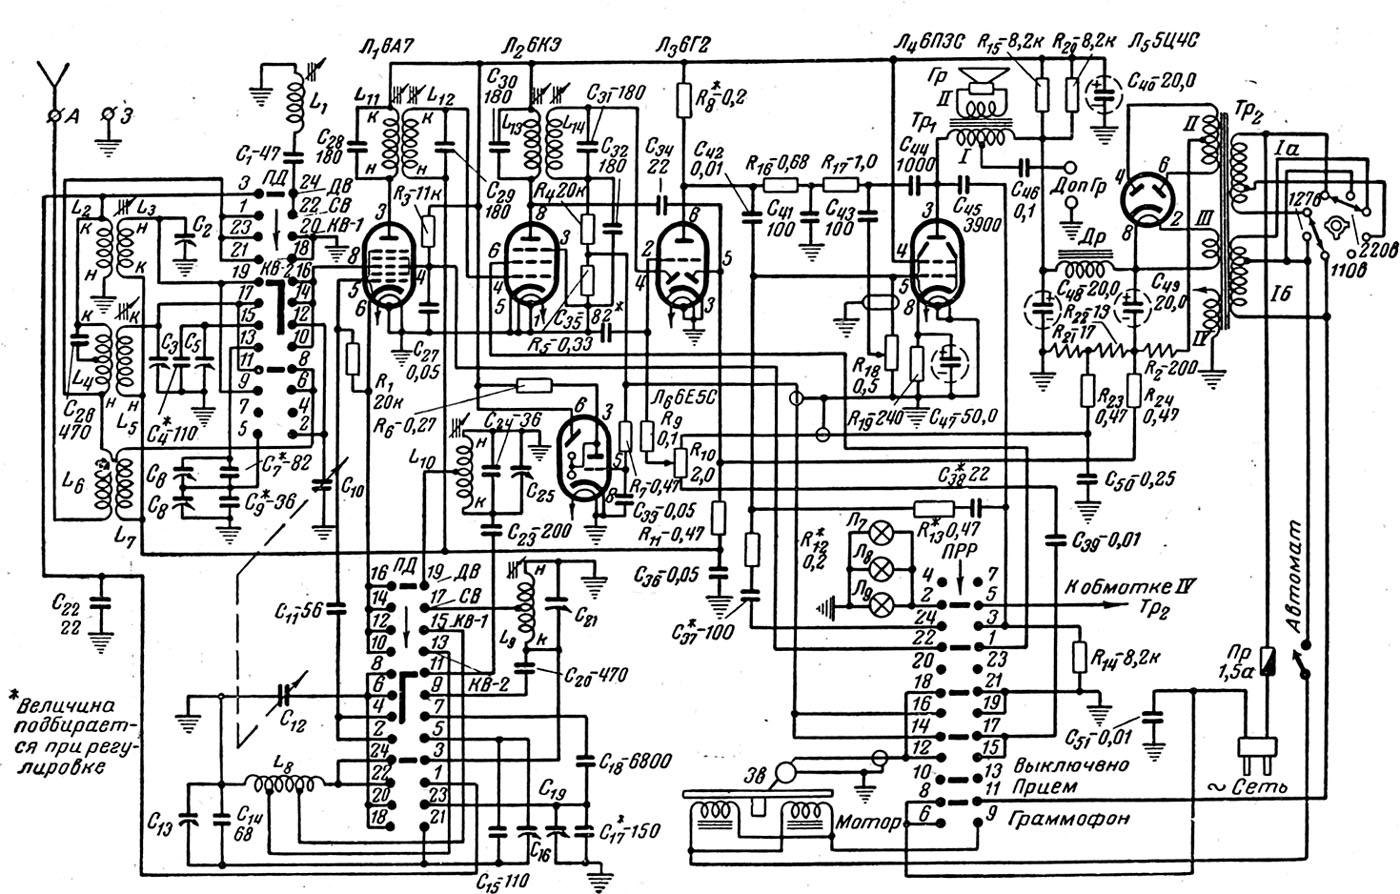 Радиола урал 111 схема фото 842